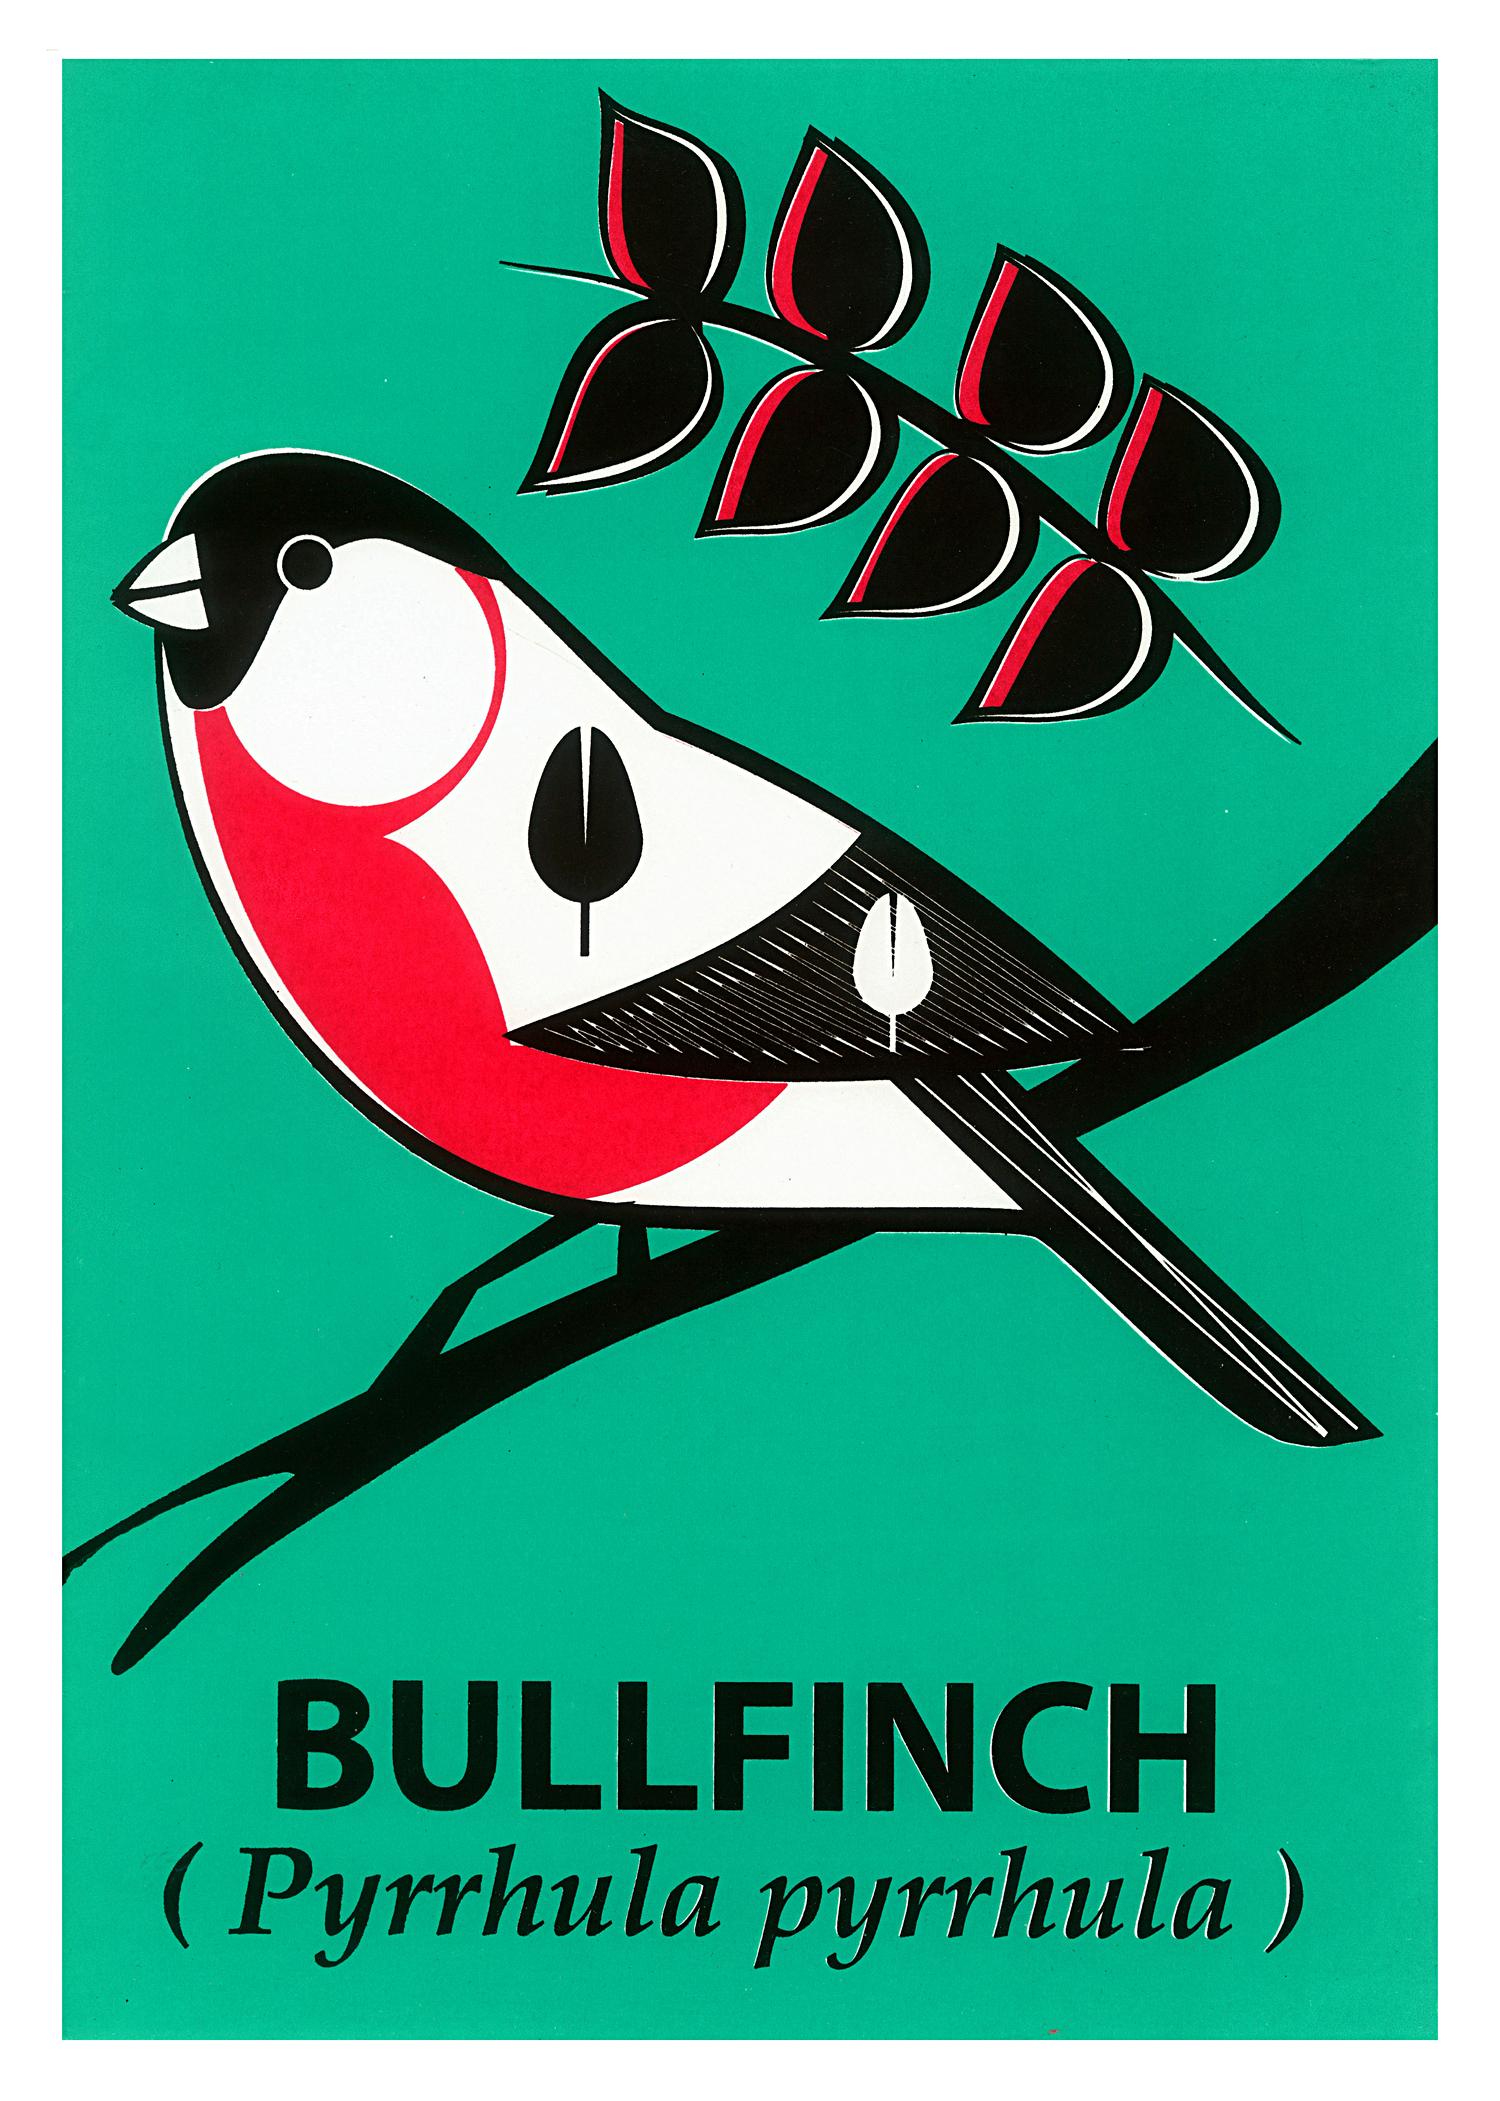 Limited Edition Bullfinch Screenprint